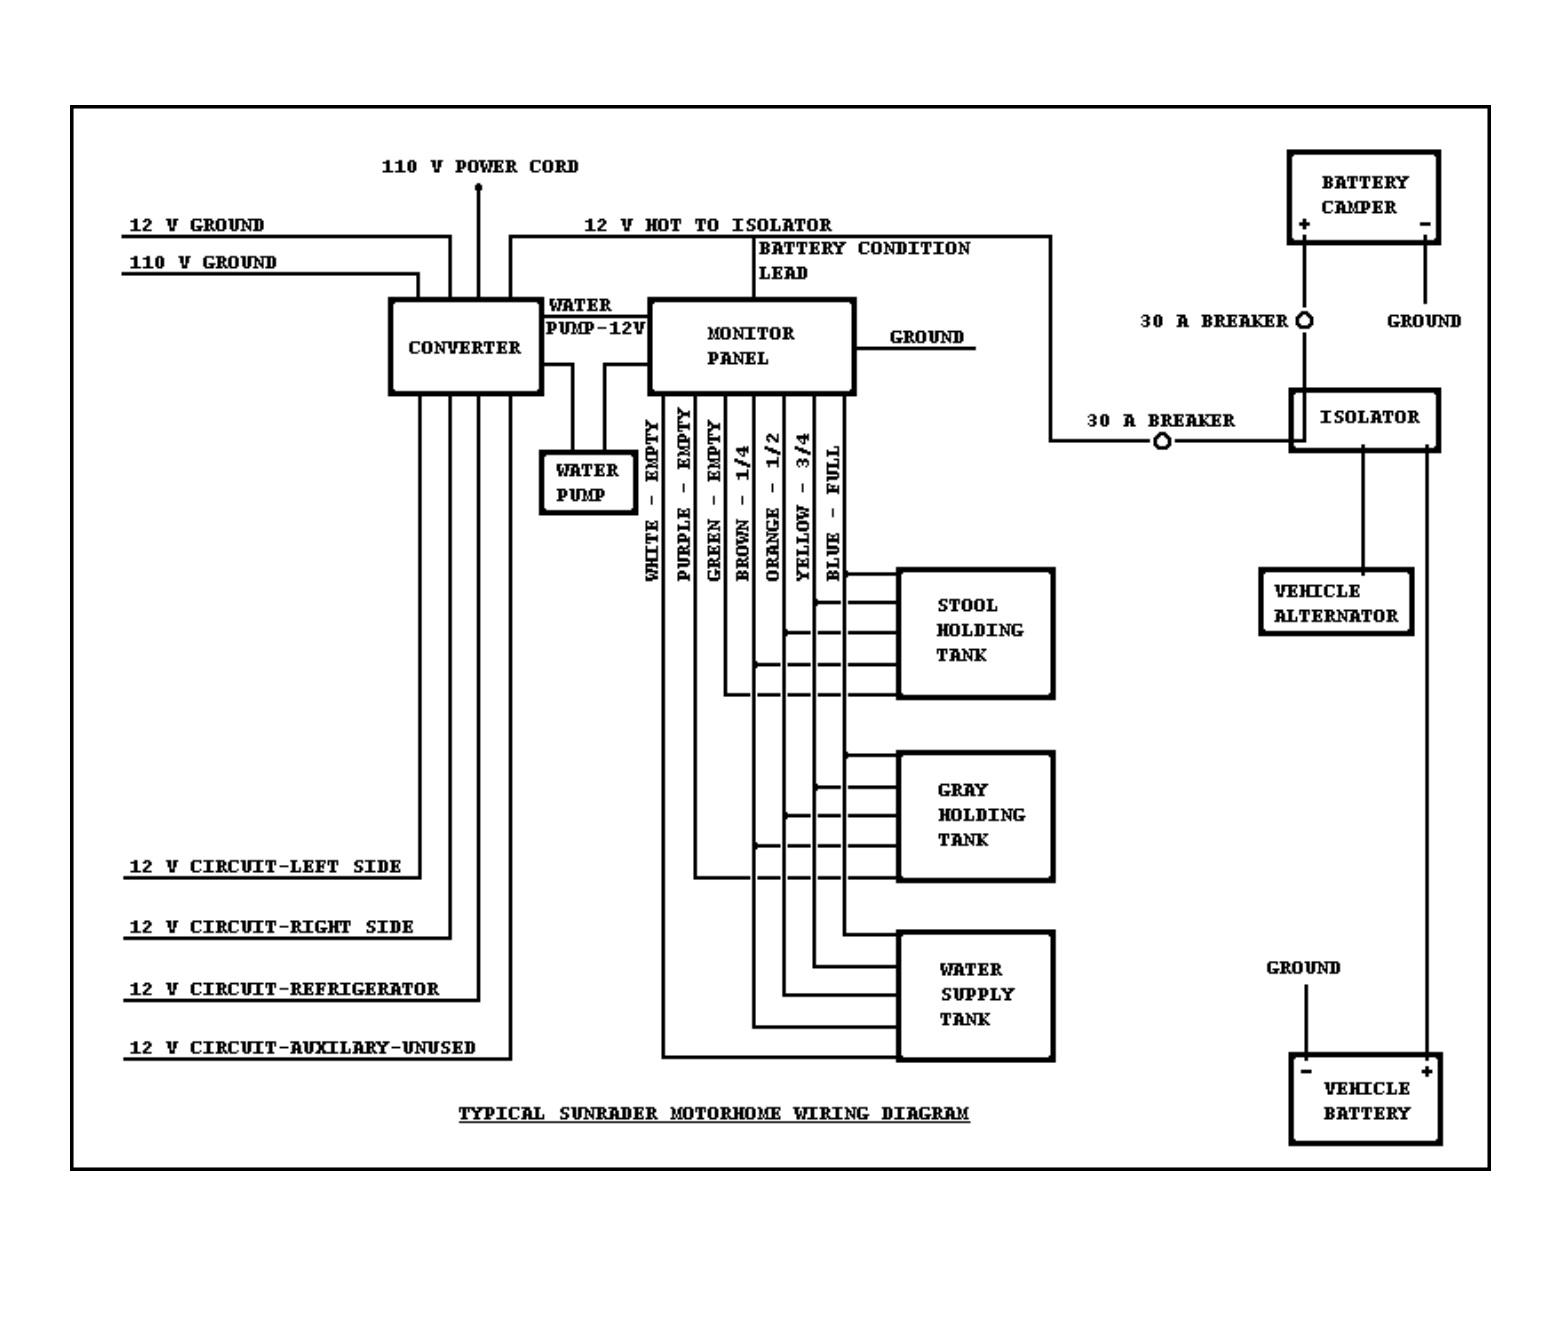 Wiring Manual PDF: 110 Volt Battery Isolator Wiring Diagram